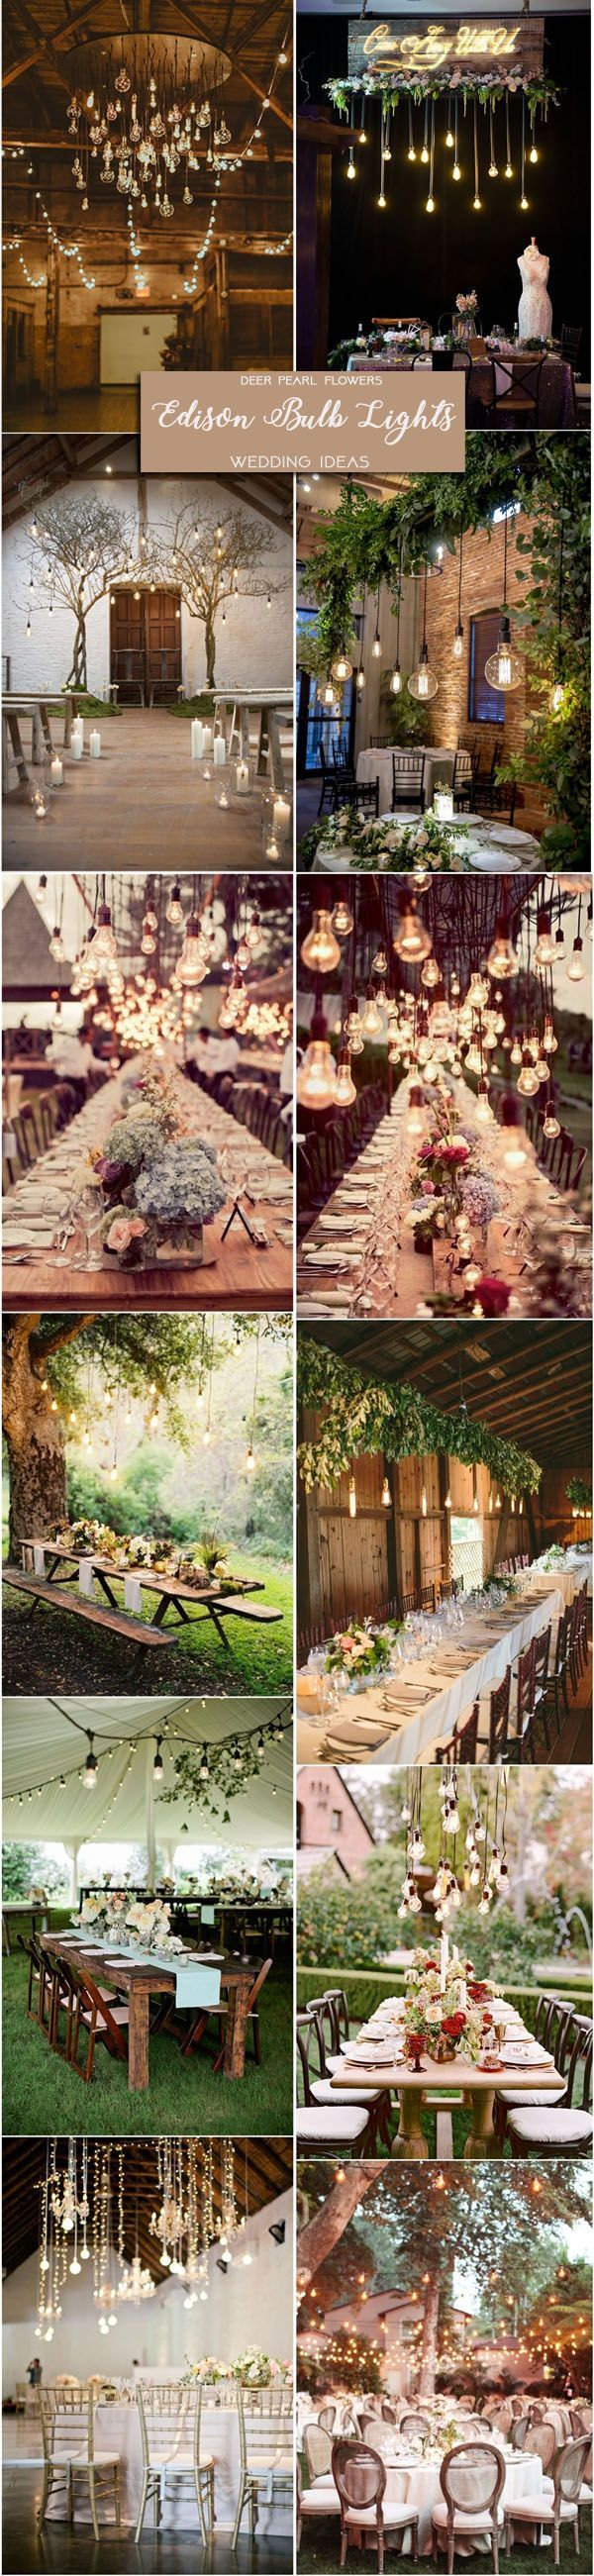 Wedding room decoration ideas 2018  Top  Rustic Wedding Themes u Ideas for  Part II  Bulb lights